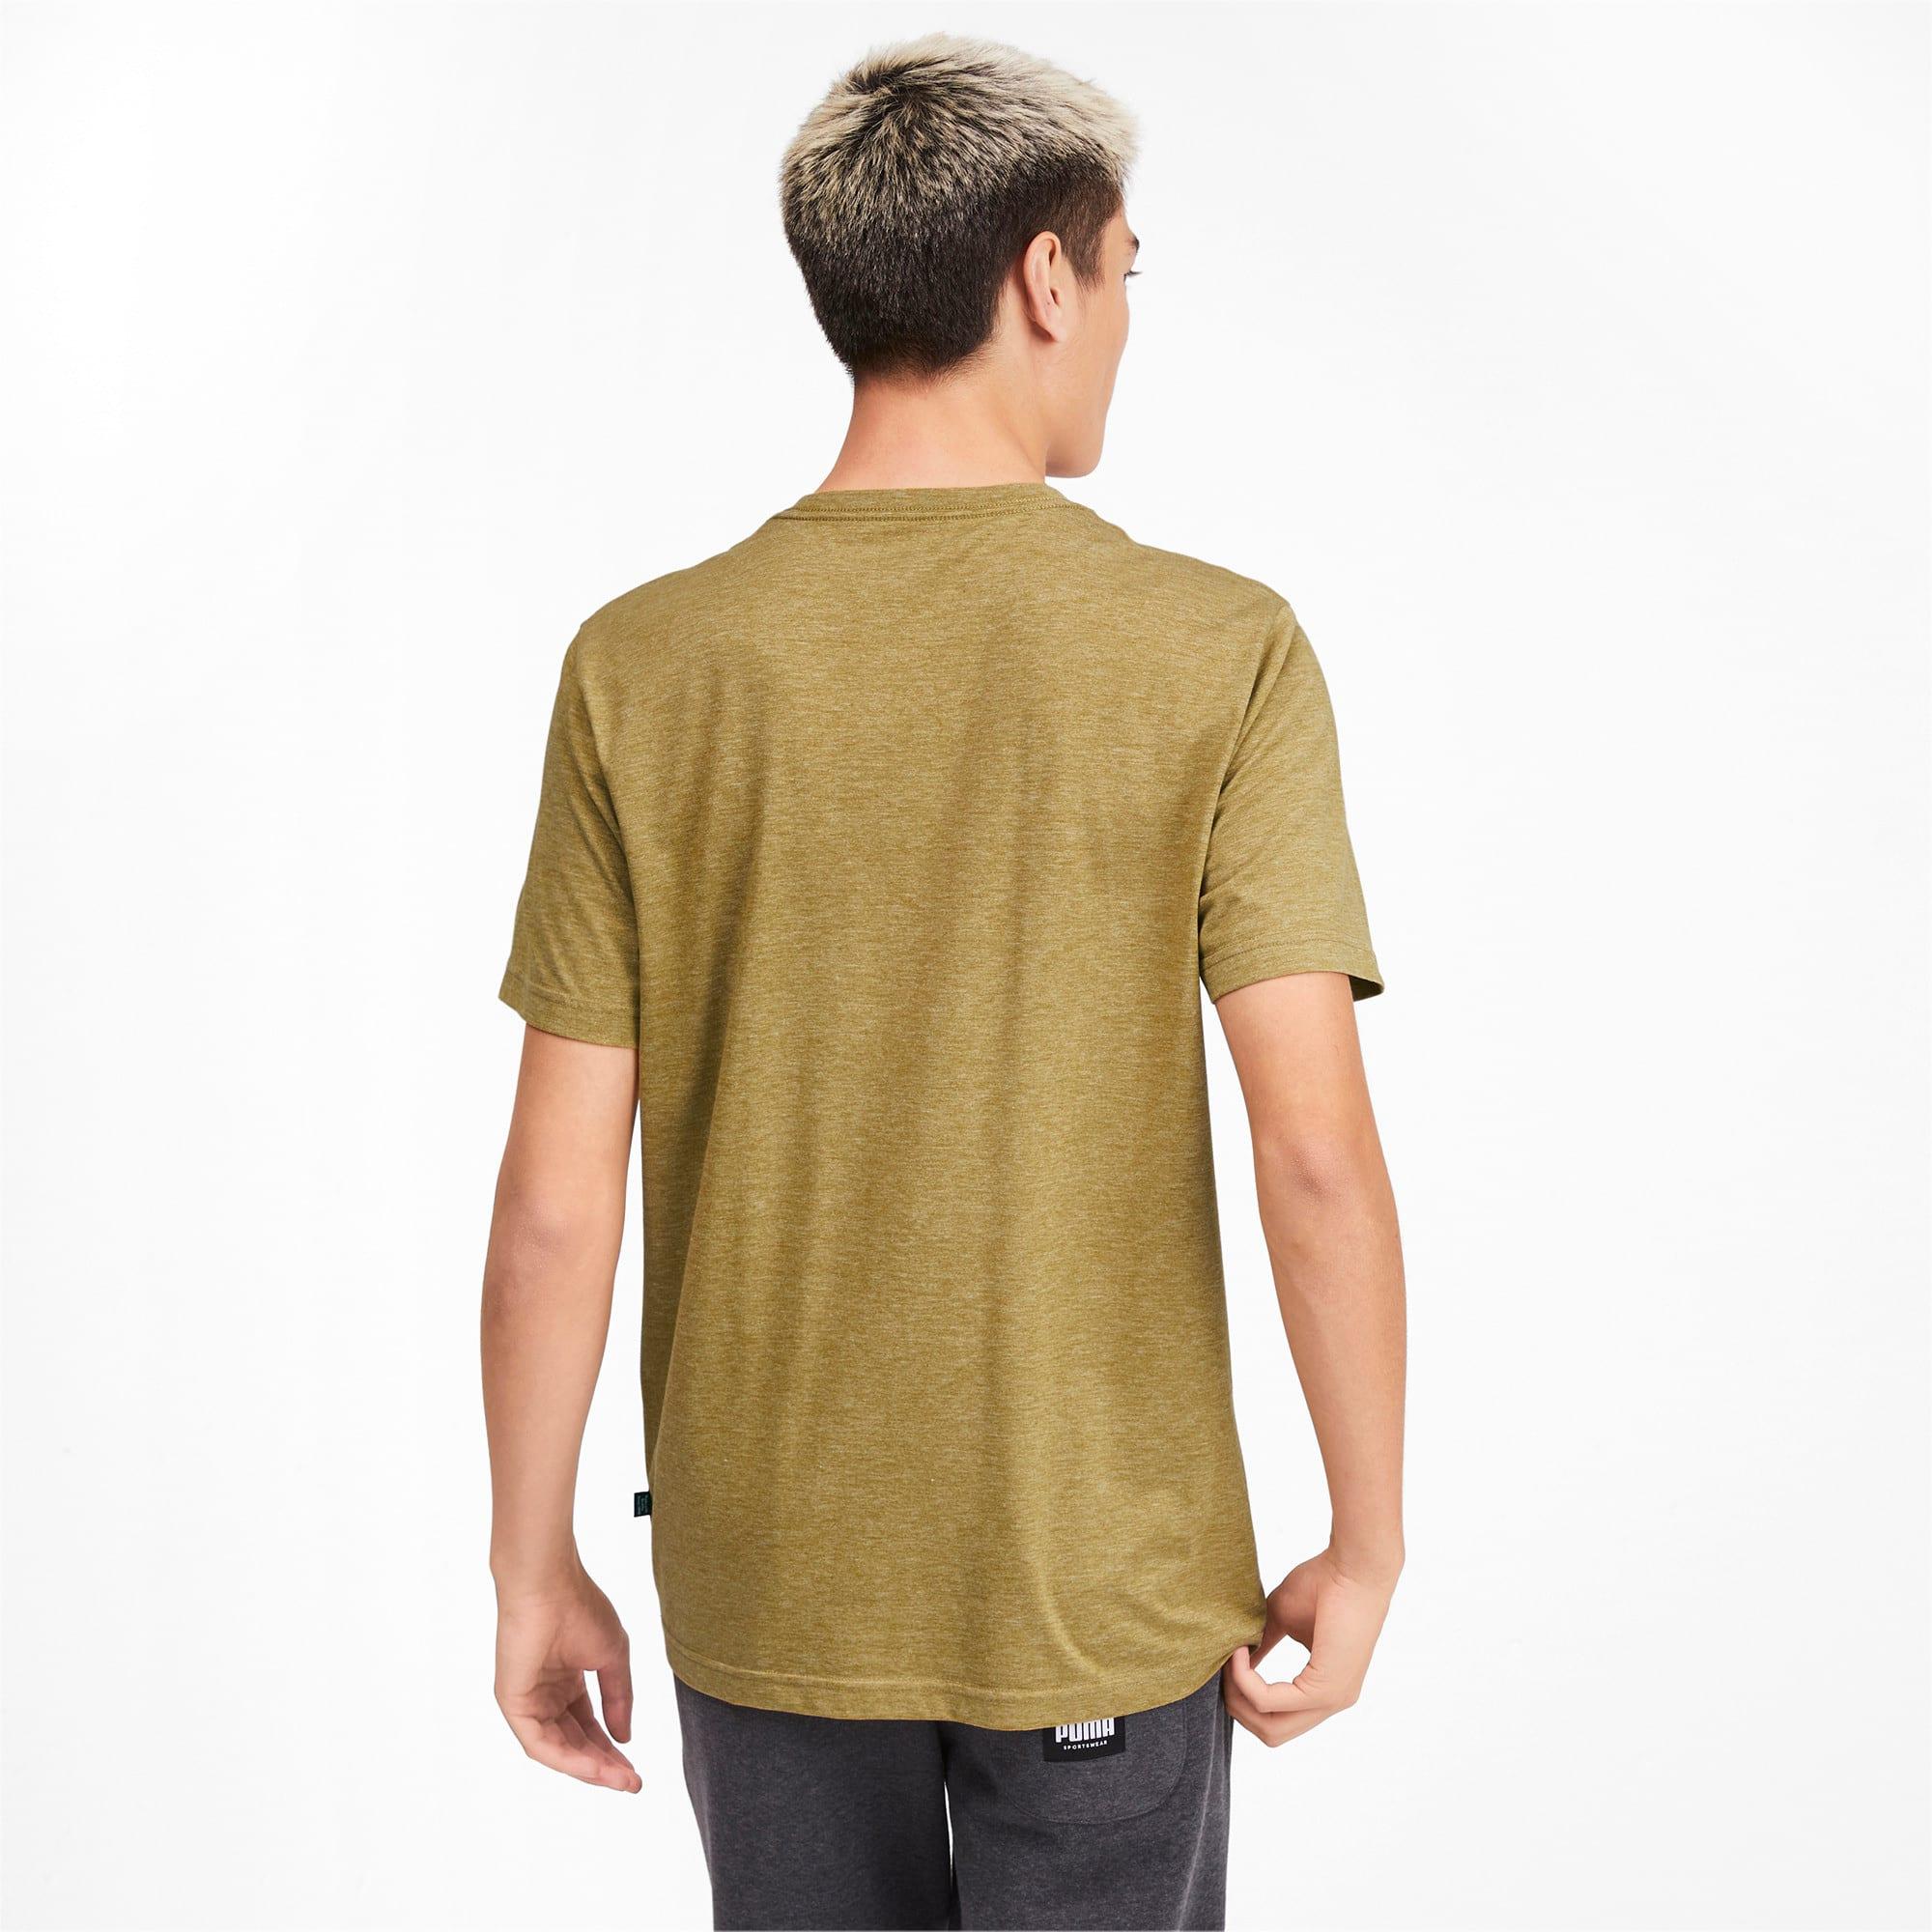 Thumbnail 2 of Meska koszulka Essentials+ Heathered, Moss Green Heather, medium